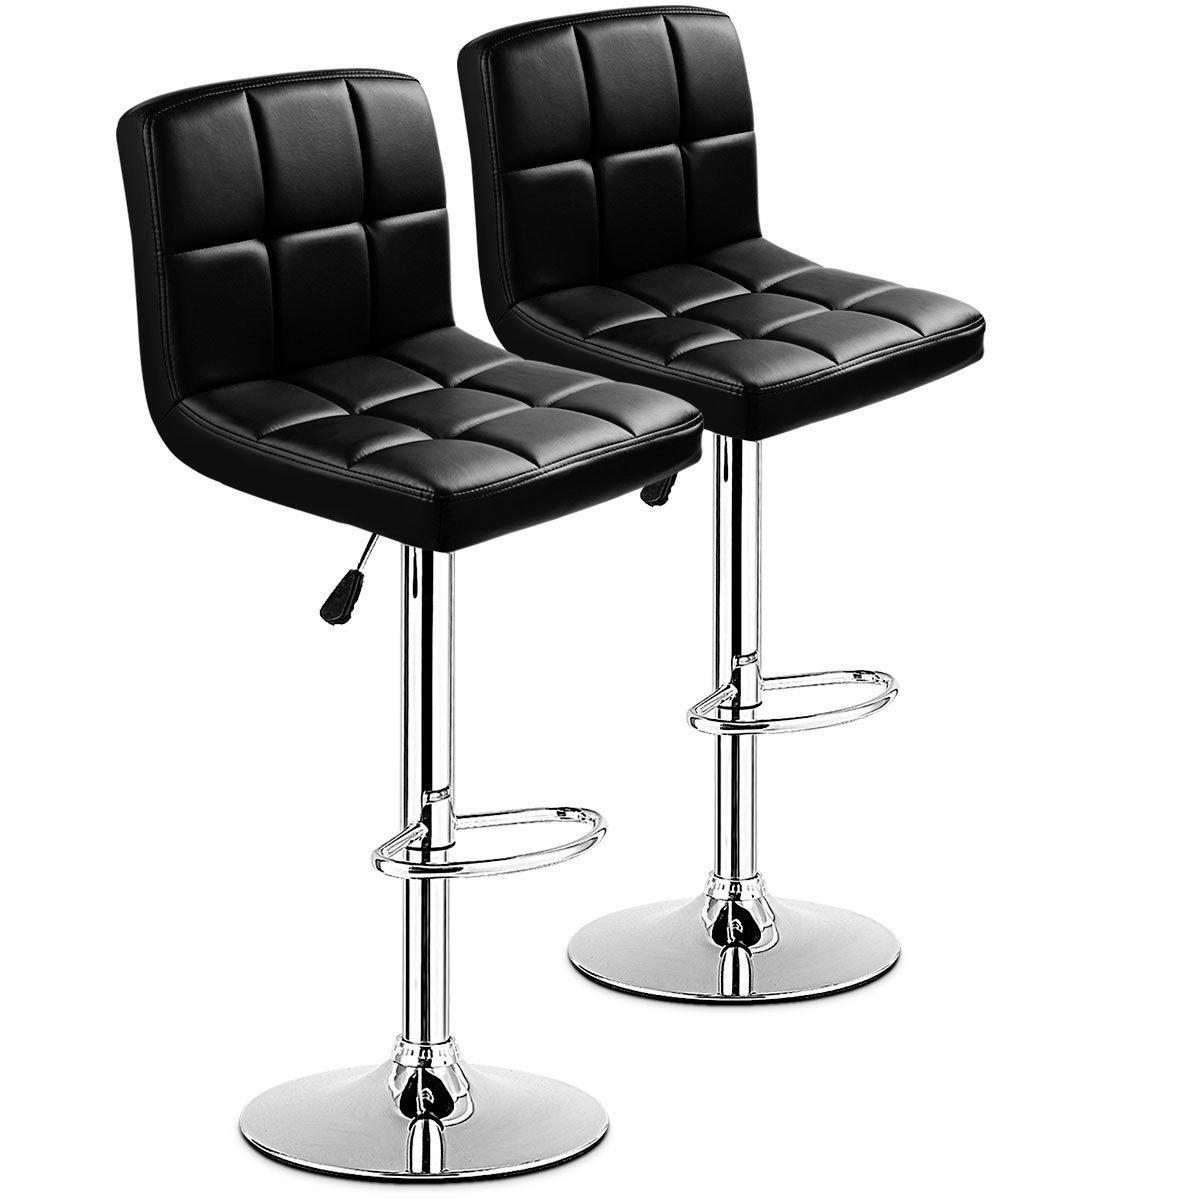 Costway Set Of 2 Bar Stools PU Leather Adjustable Barstool Swivel Pub Chairs Black